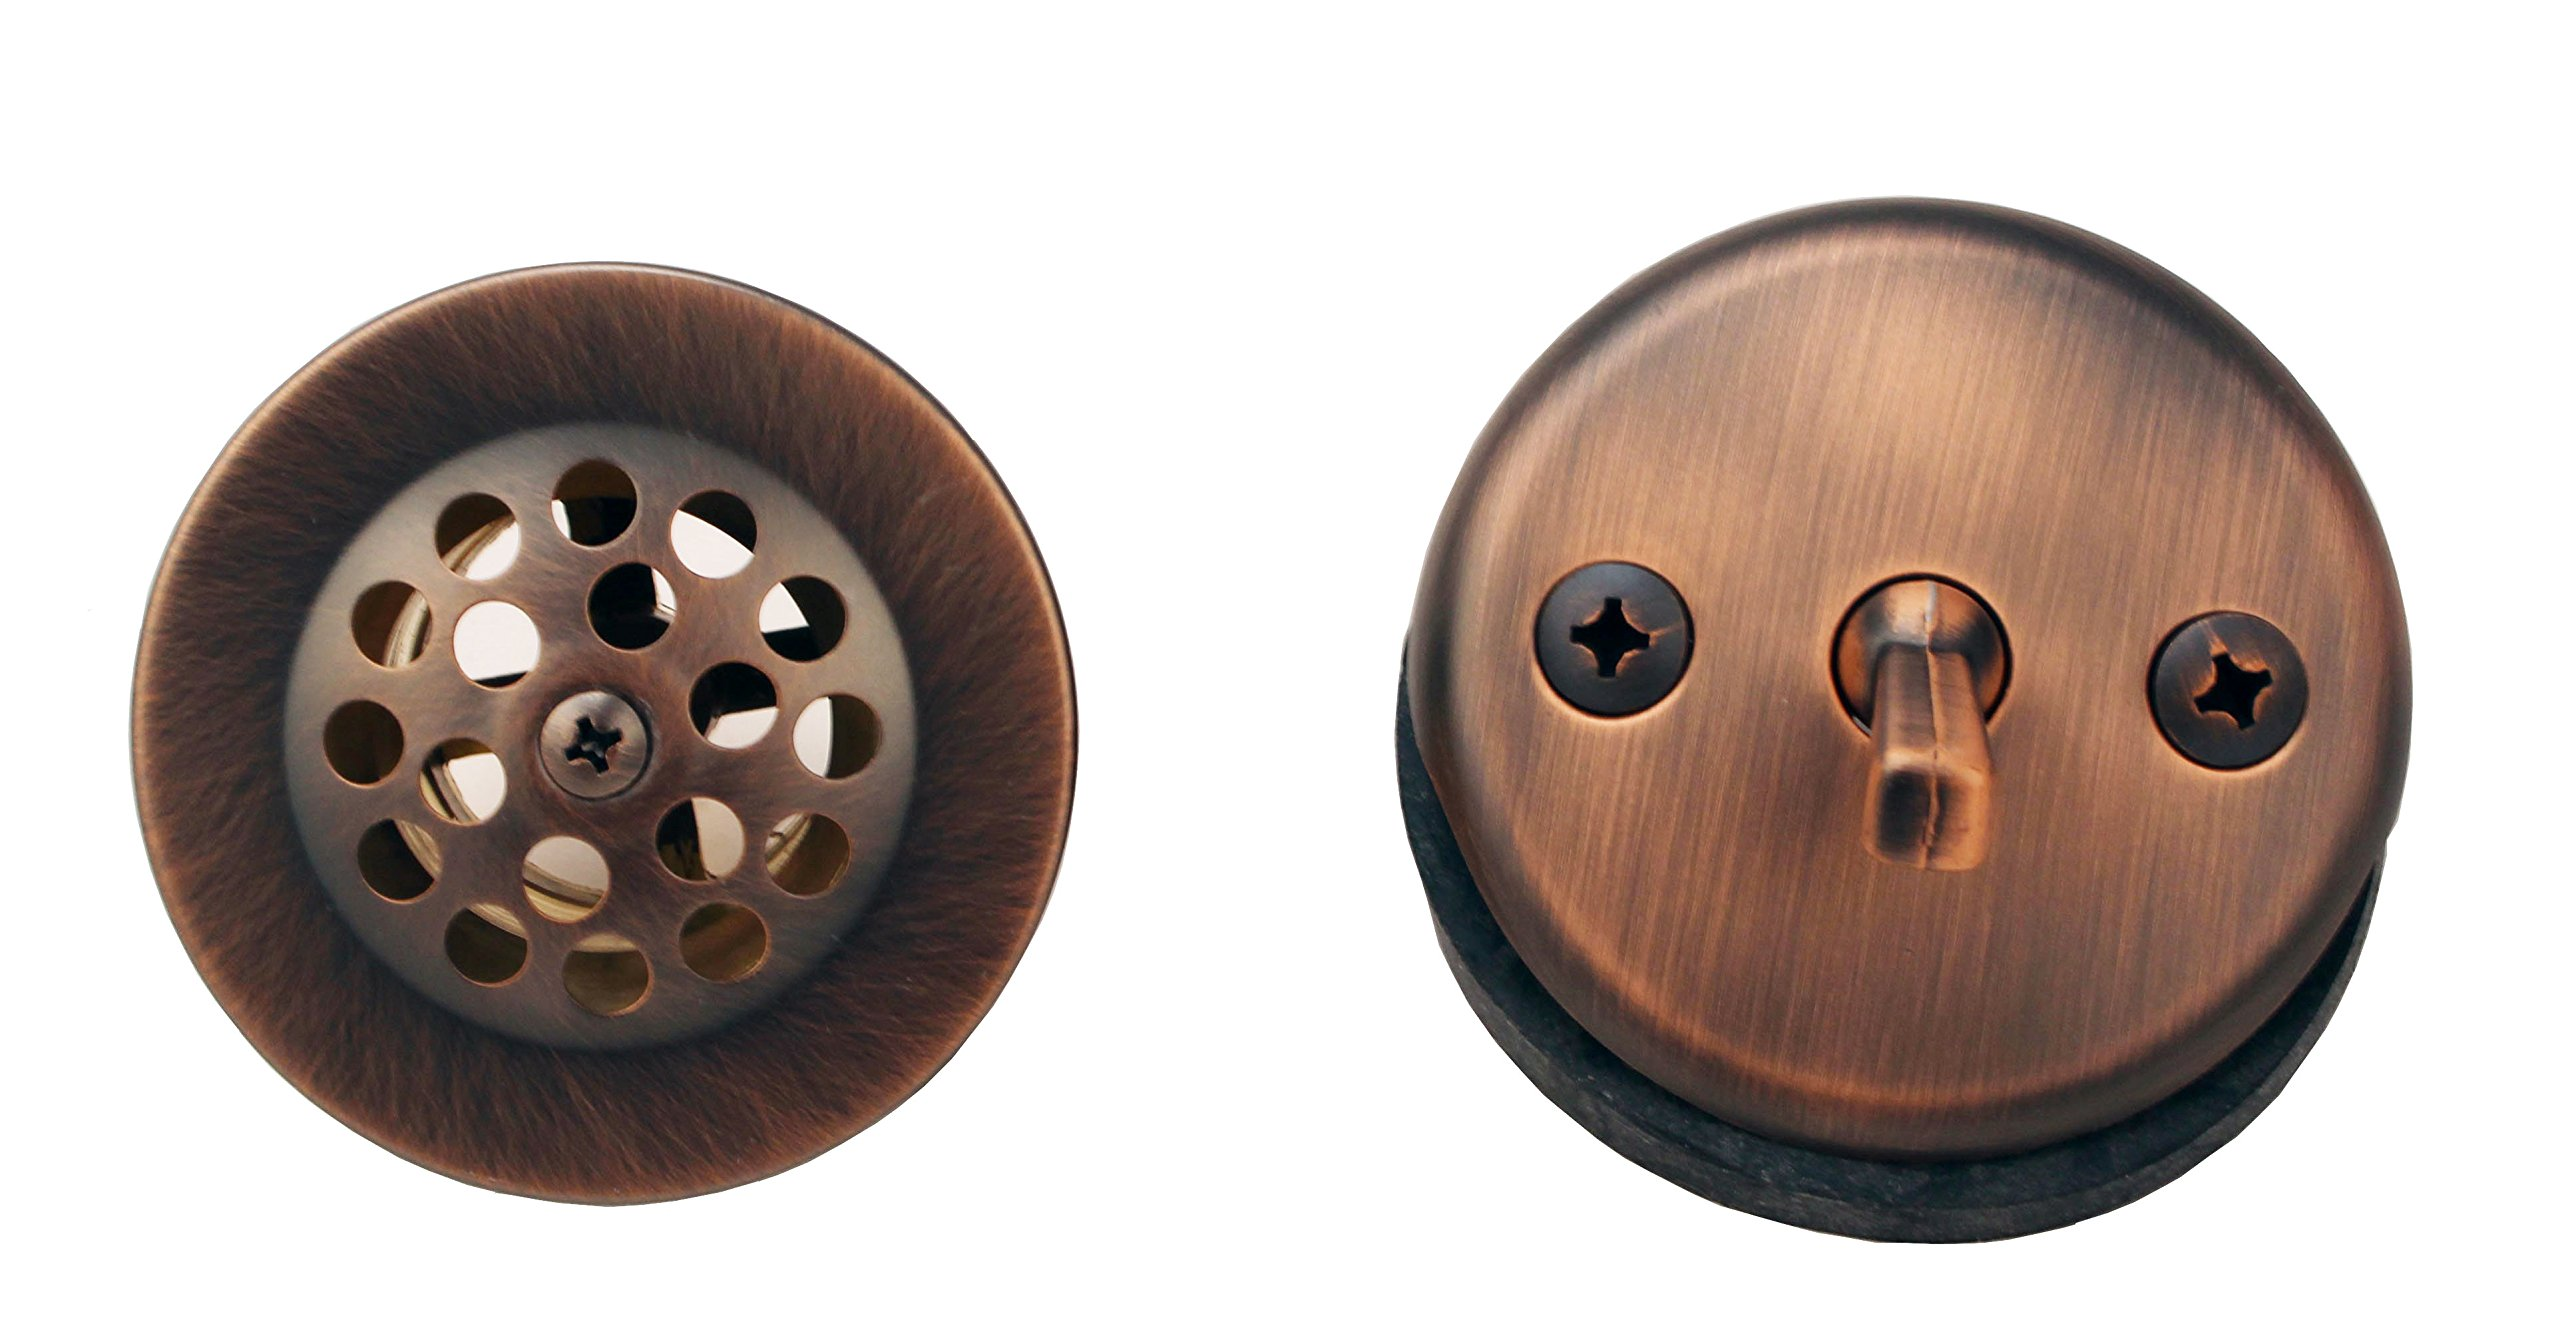 Bathtub Tub Replacement Drain Trim kit - Antique Copper Finish, Venetian Bronze, Trip Lever Type, By Plumb USA